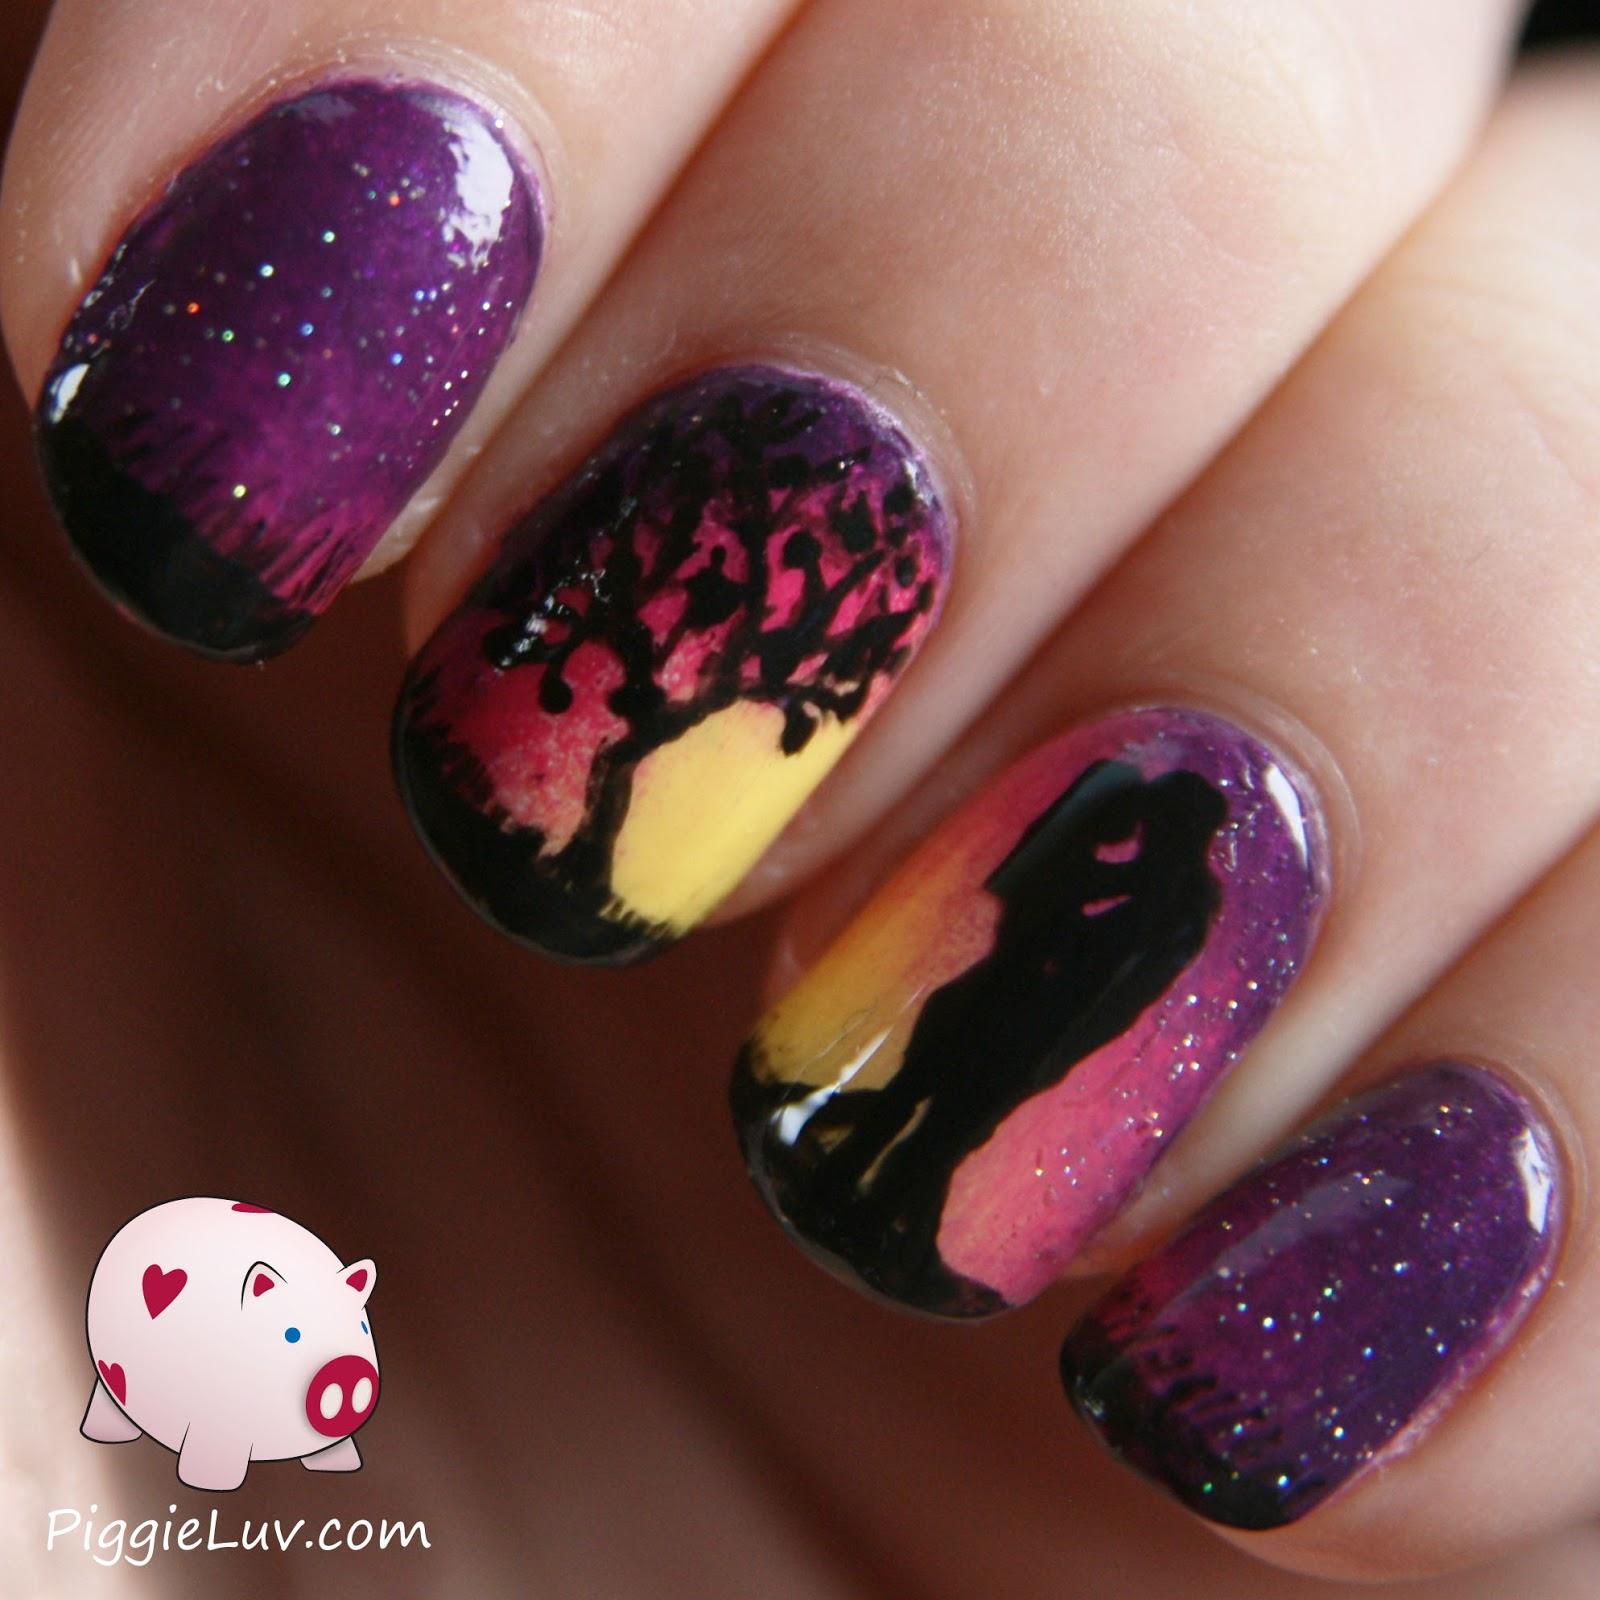 PiggieLuv: Romantic sunset nail art